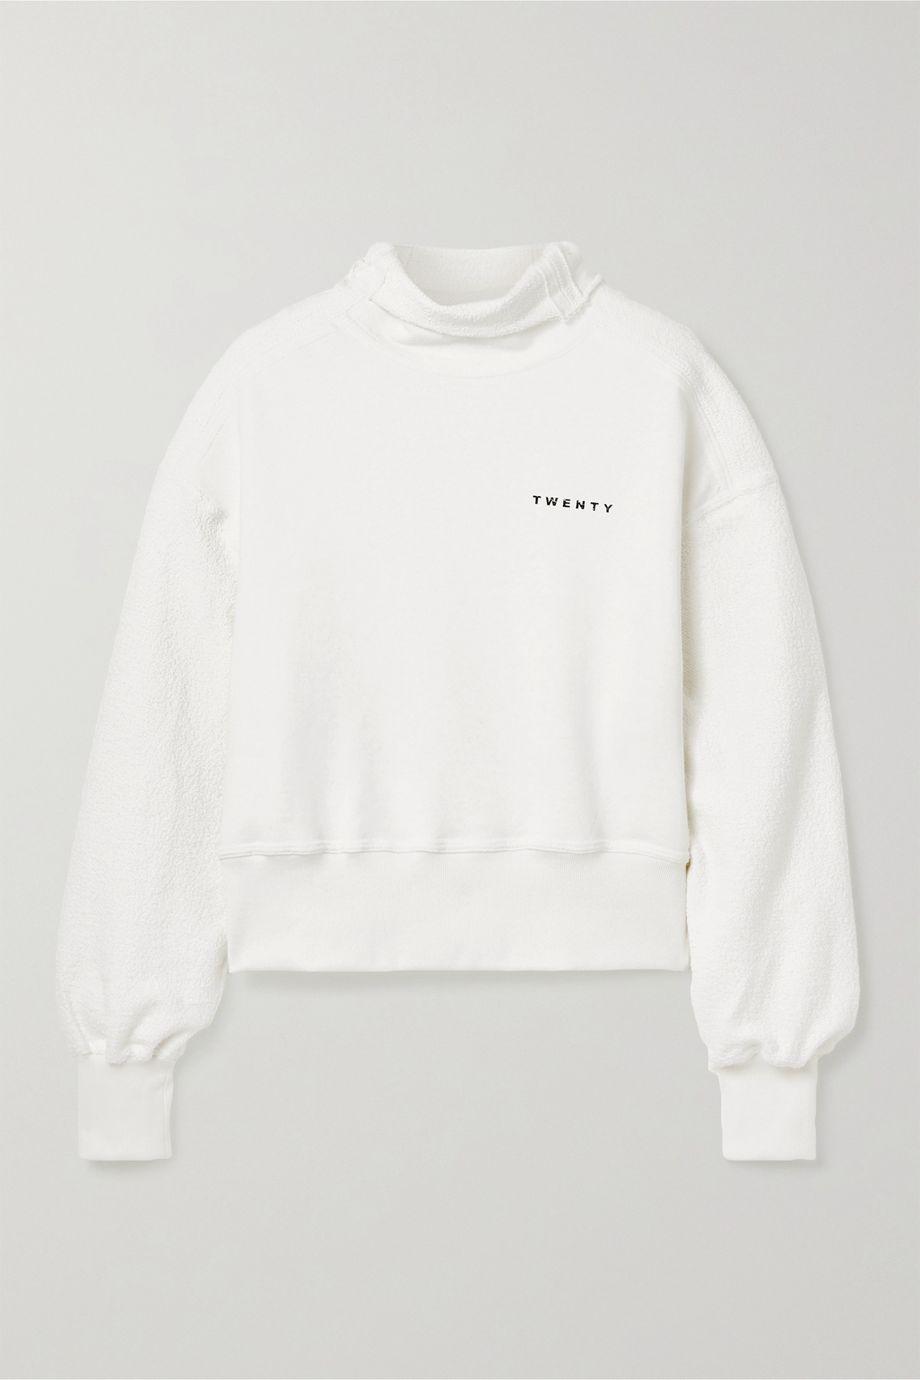 TWENTY Montréal Sunnyside printed cotton-blend terry sweatshirt